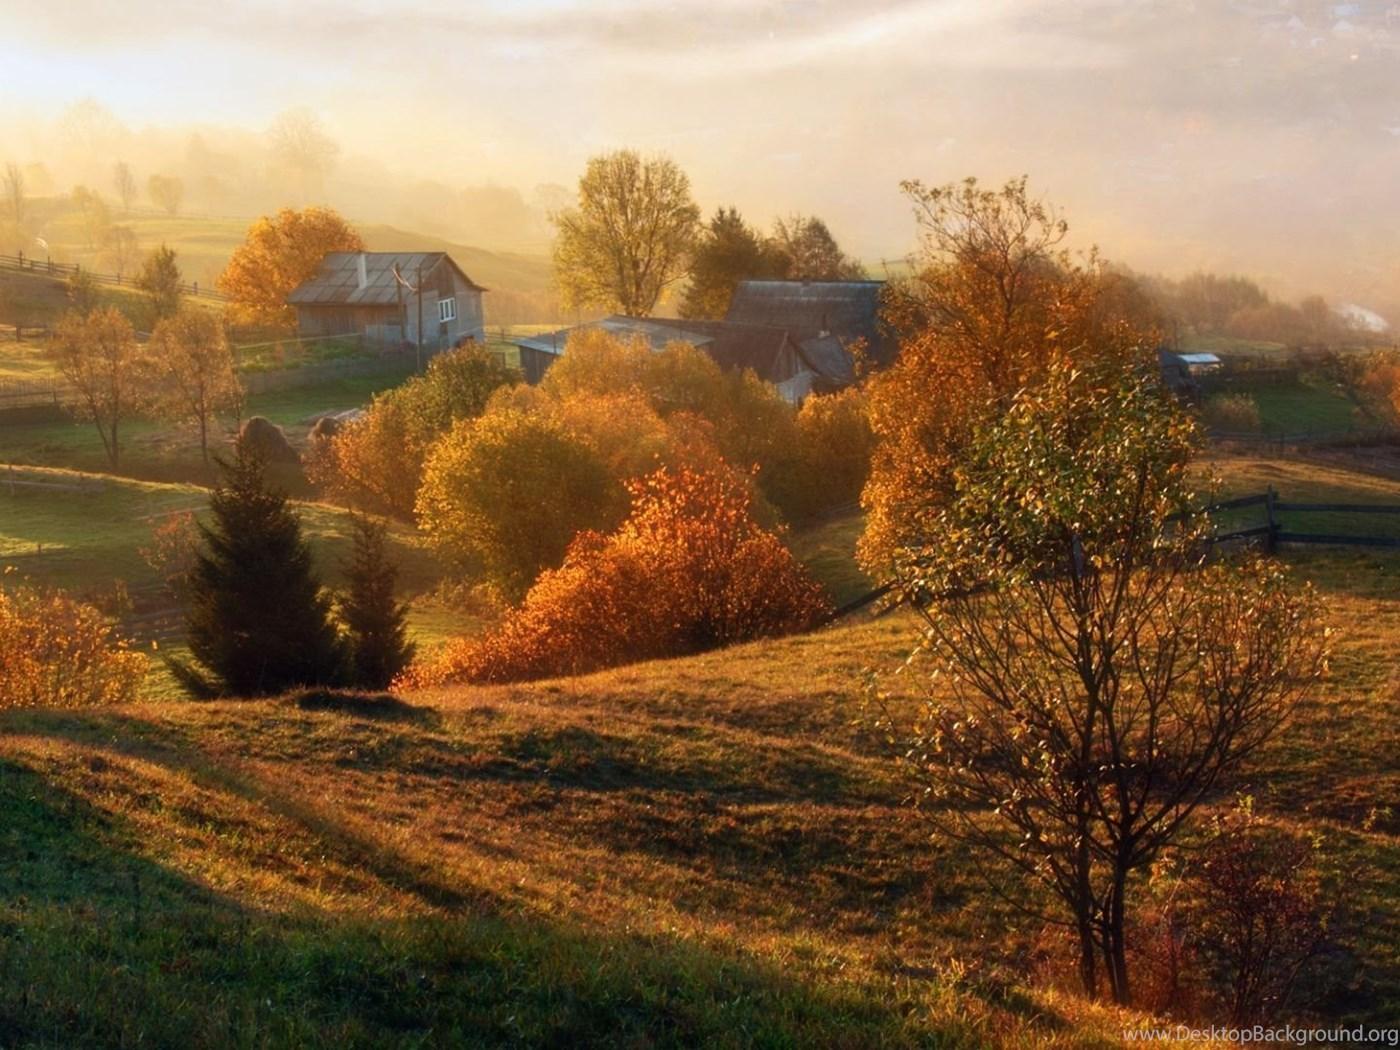 Full Hd 1080p Autumn Wallpapers Hd Desktop Backgrounds 1920x1080